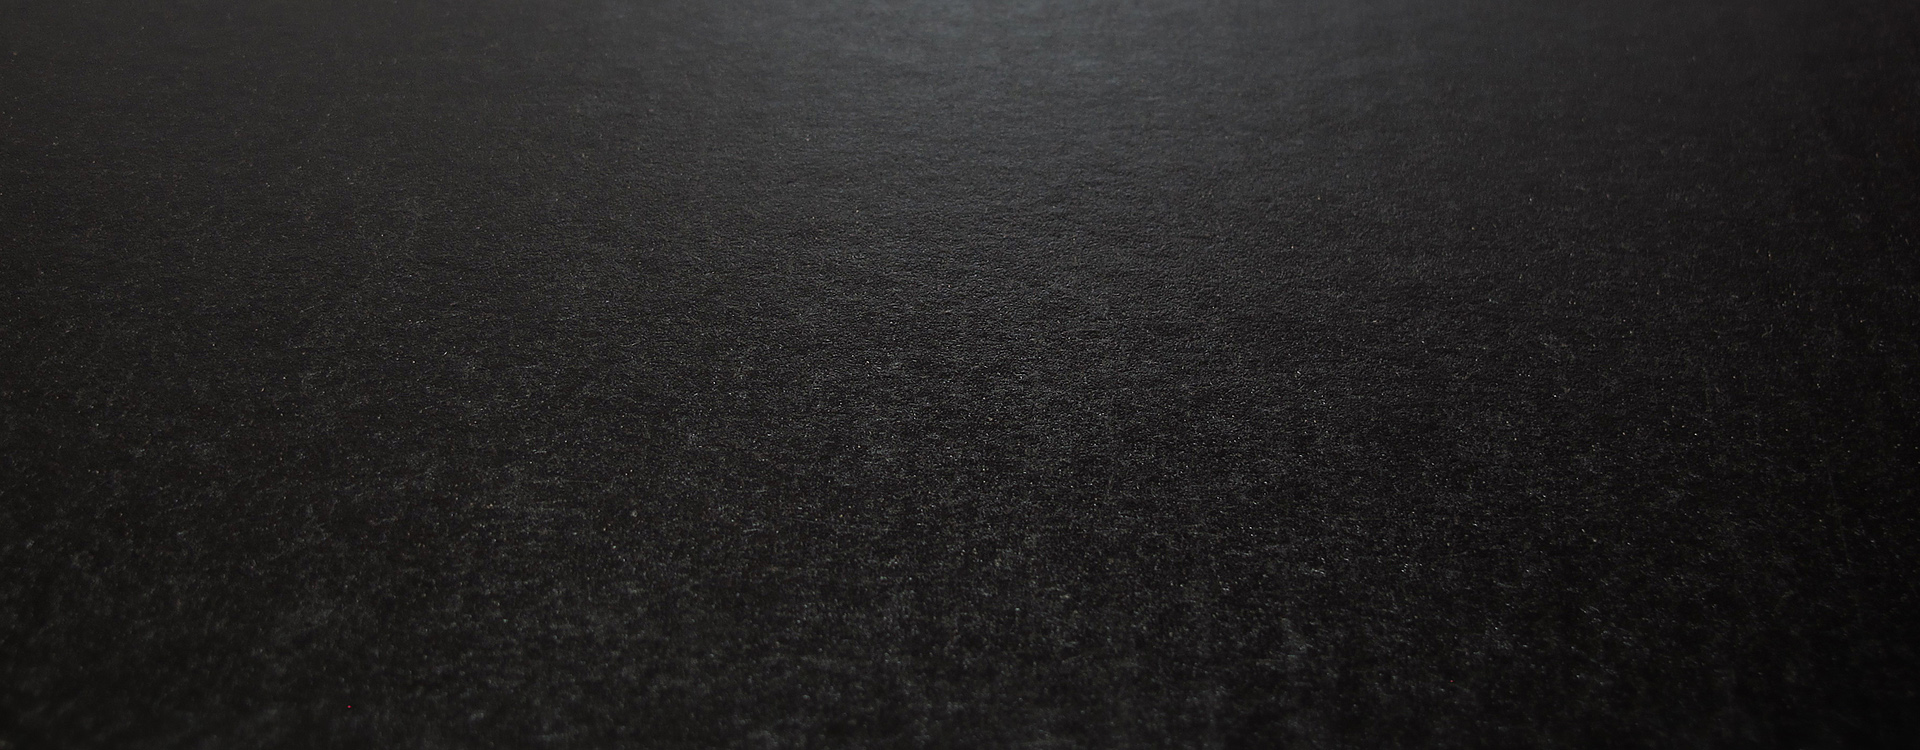 Black Gradient Background Texture, Granule, Poster, Banner